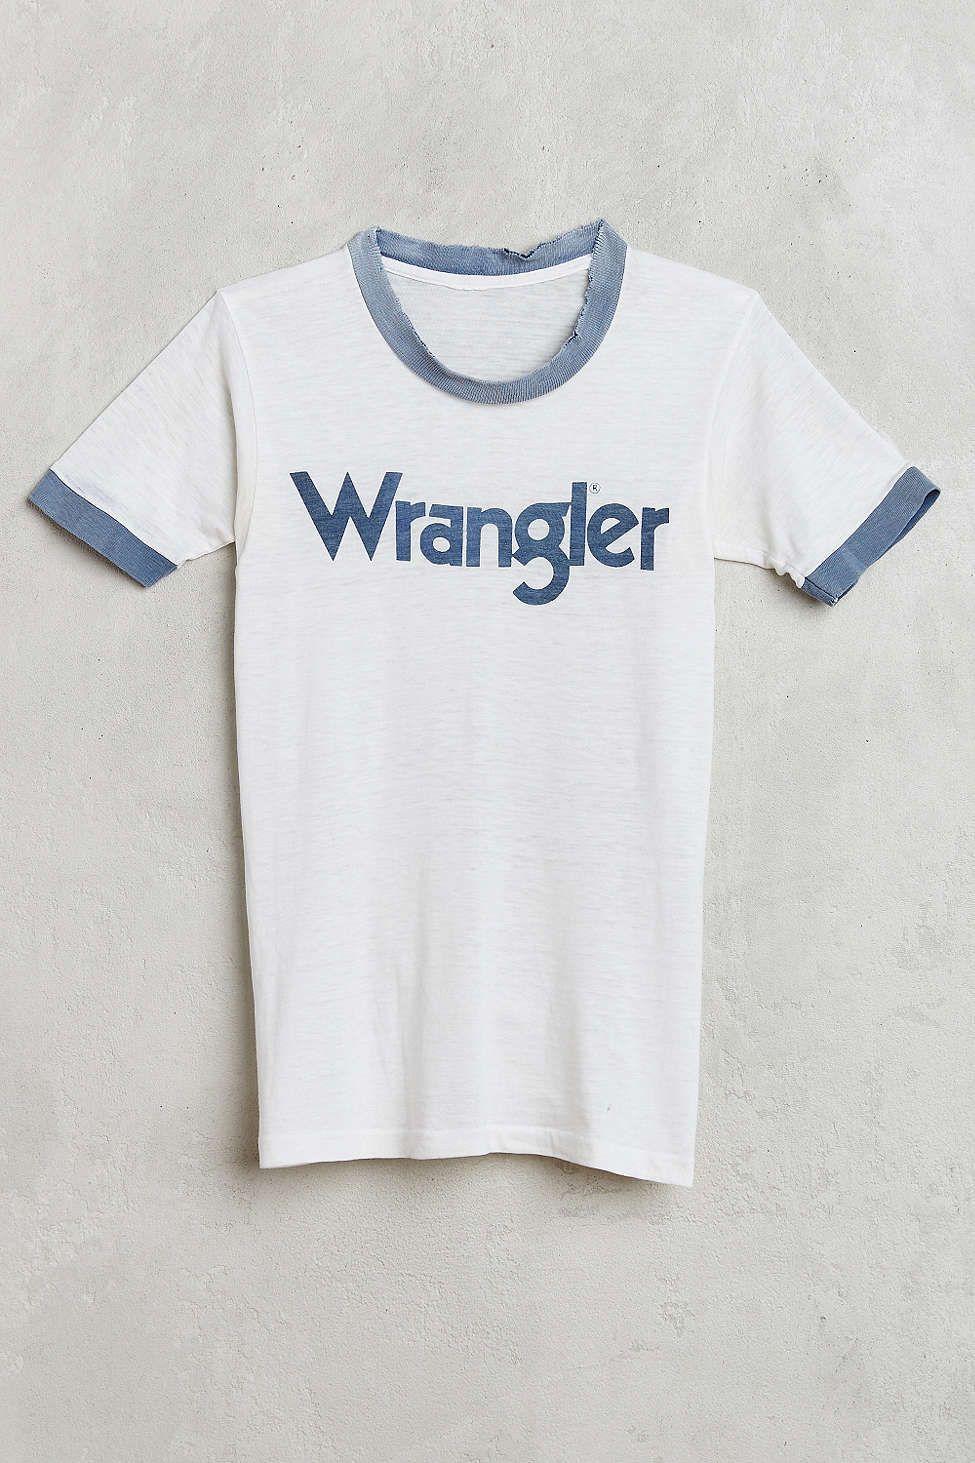 1ef71aab Vintage Wrangler Ringer Tee - Urban Outfitters | home design ...